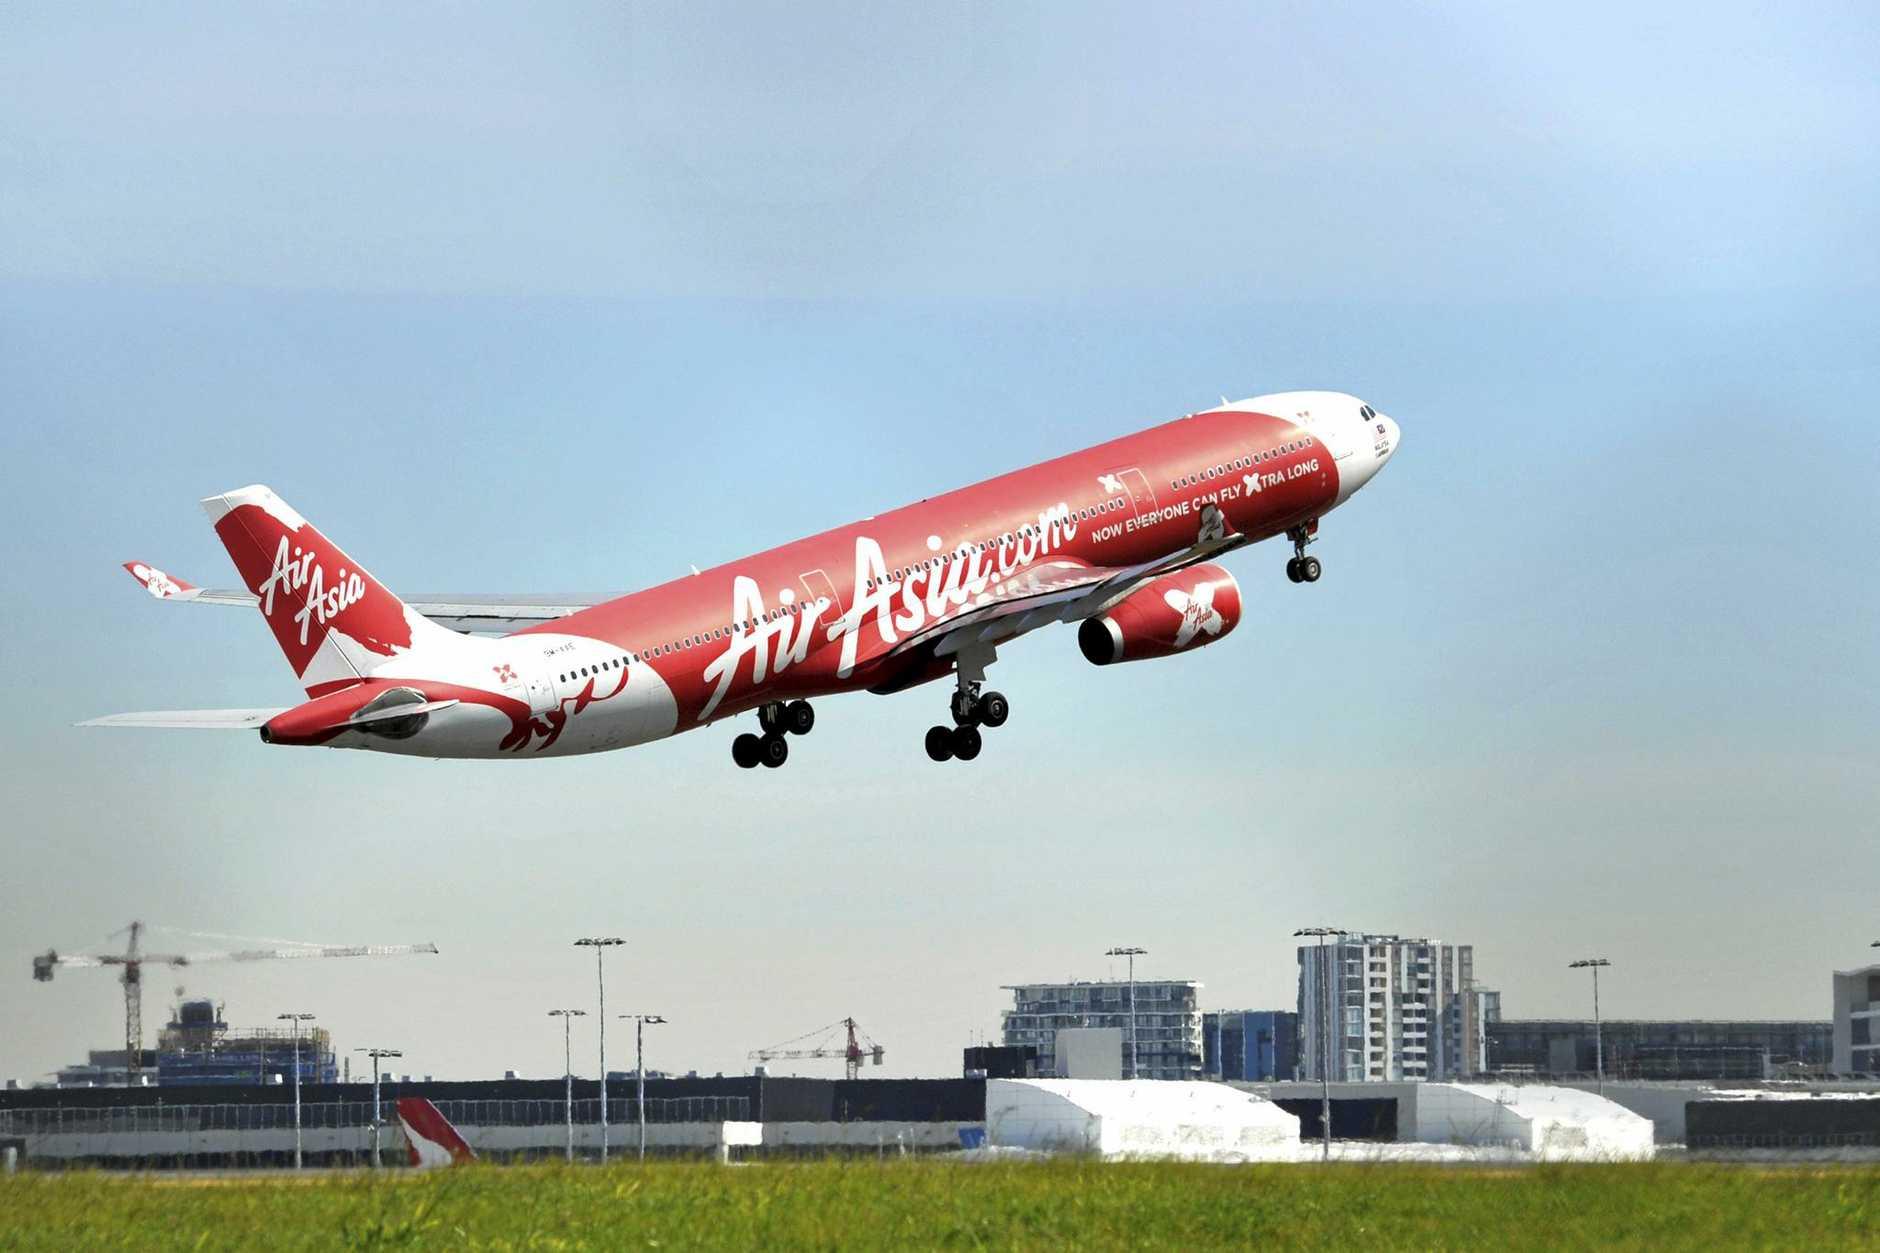 Air Asia aircraft seen at Sydney International Airport.